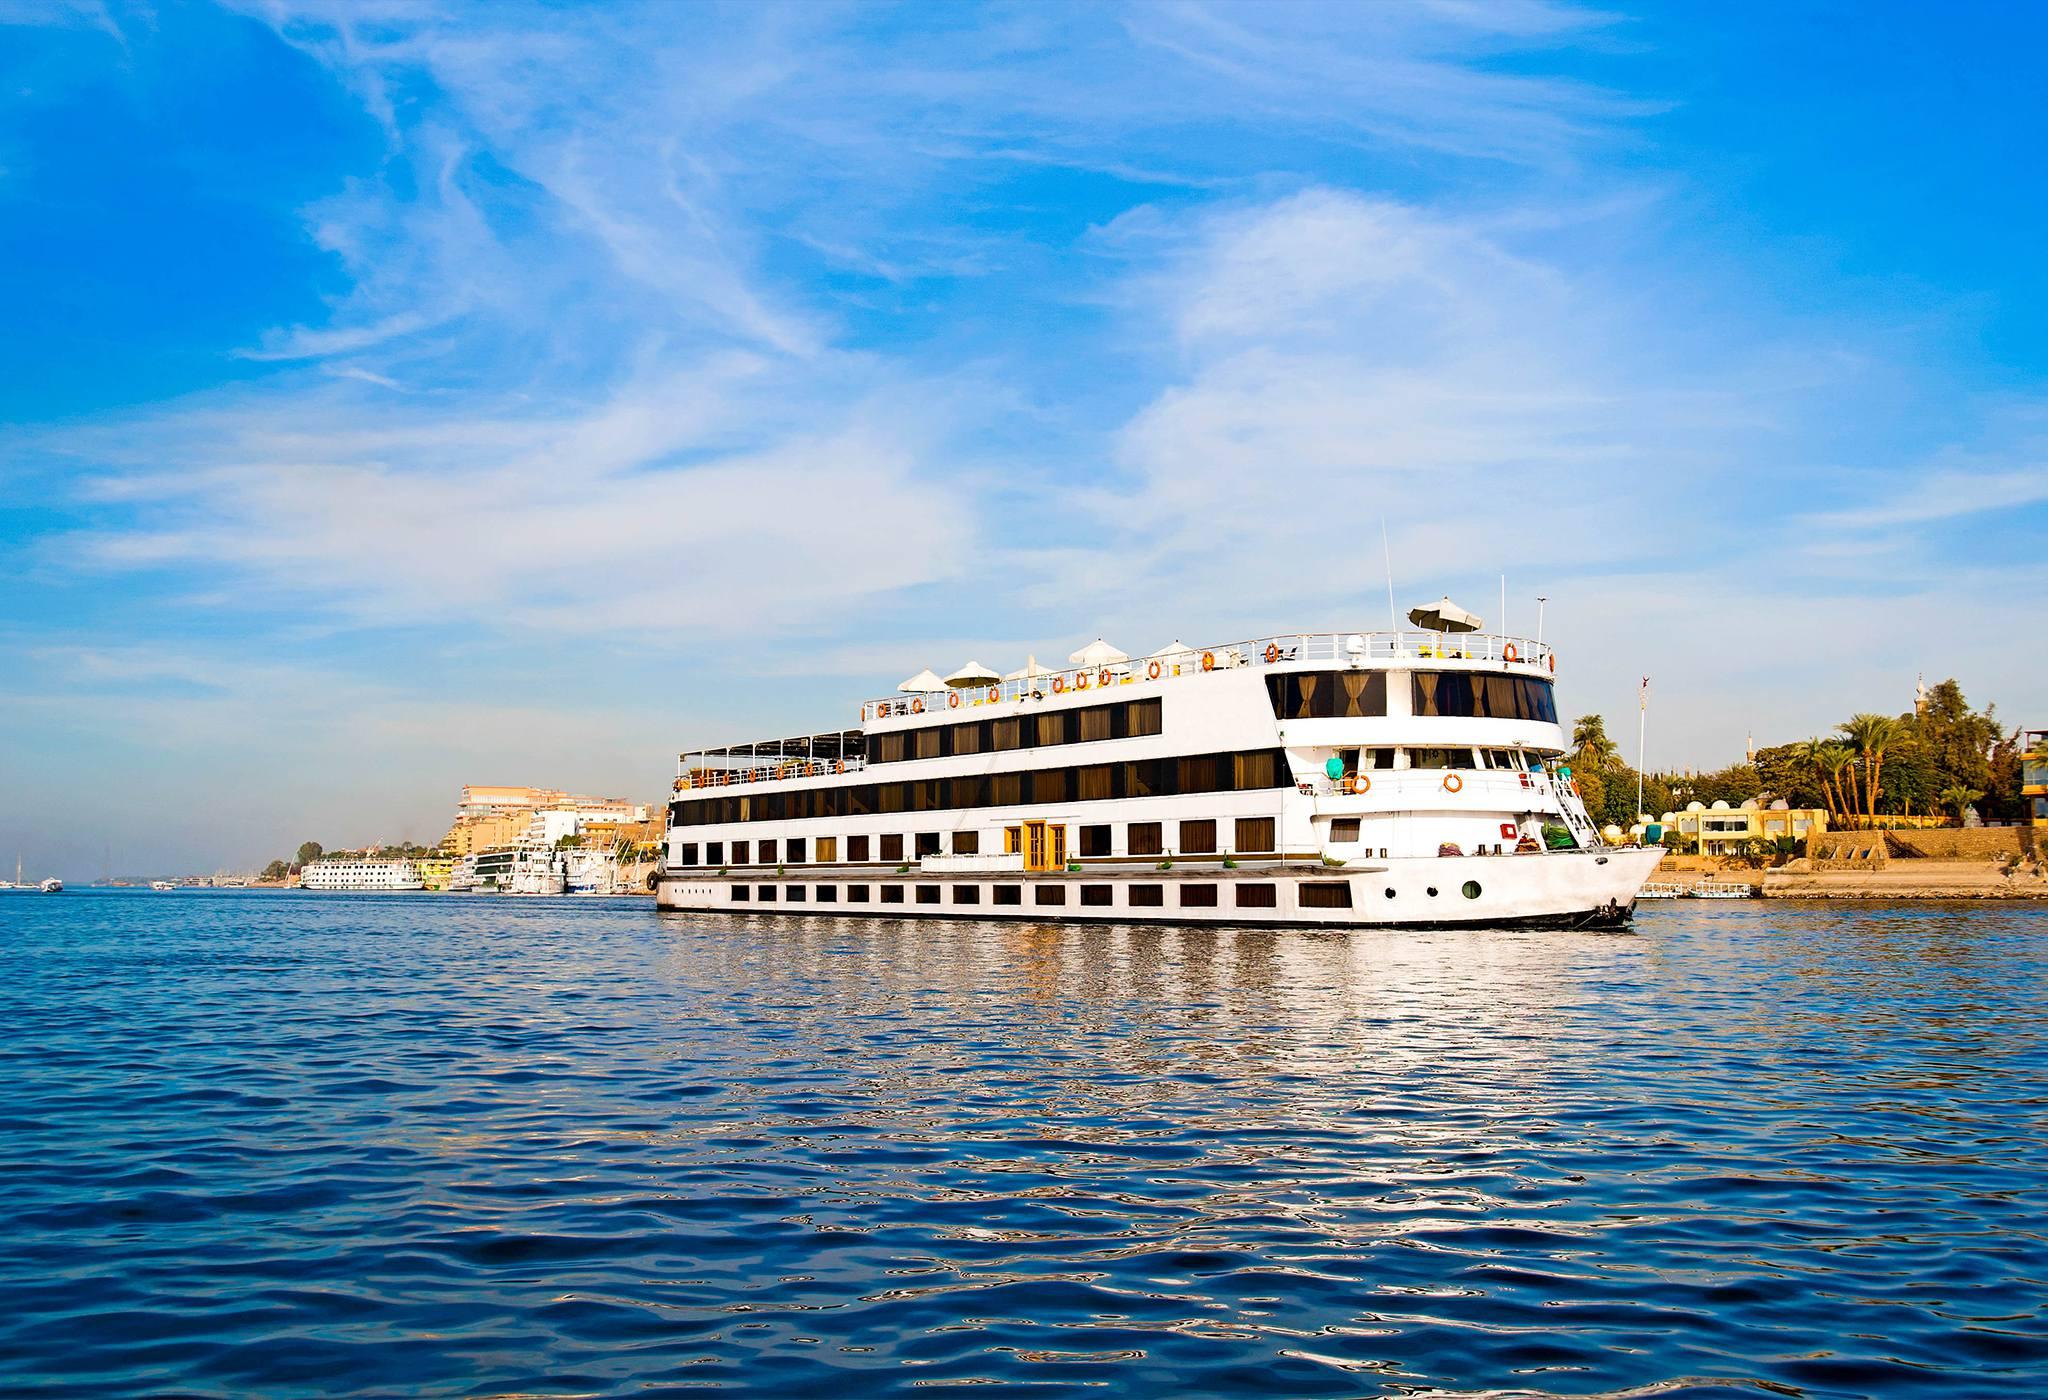 Nile Cruises from UK 2021 Holidays & Packages - Egypt Tours Portal (UK)